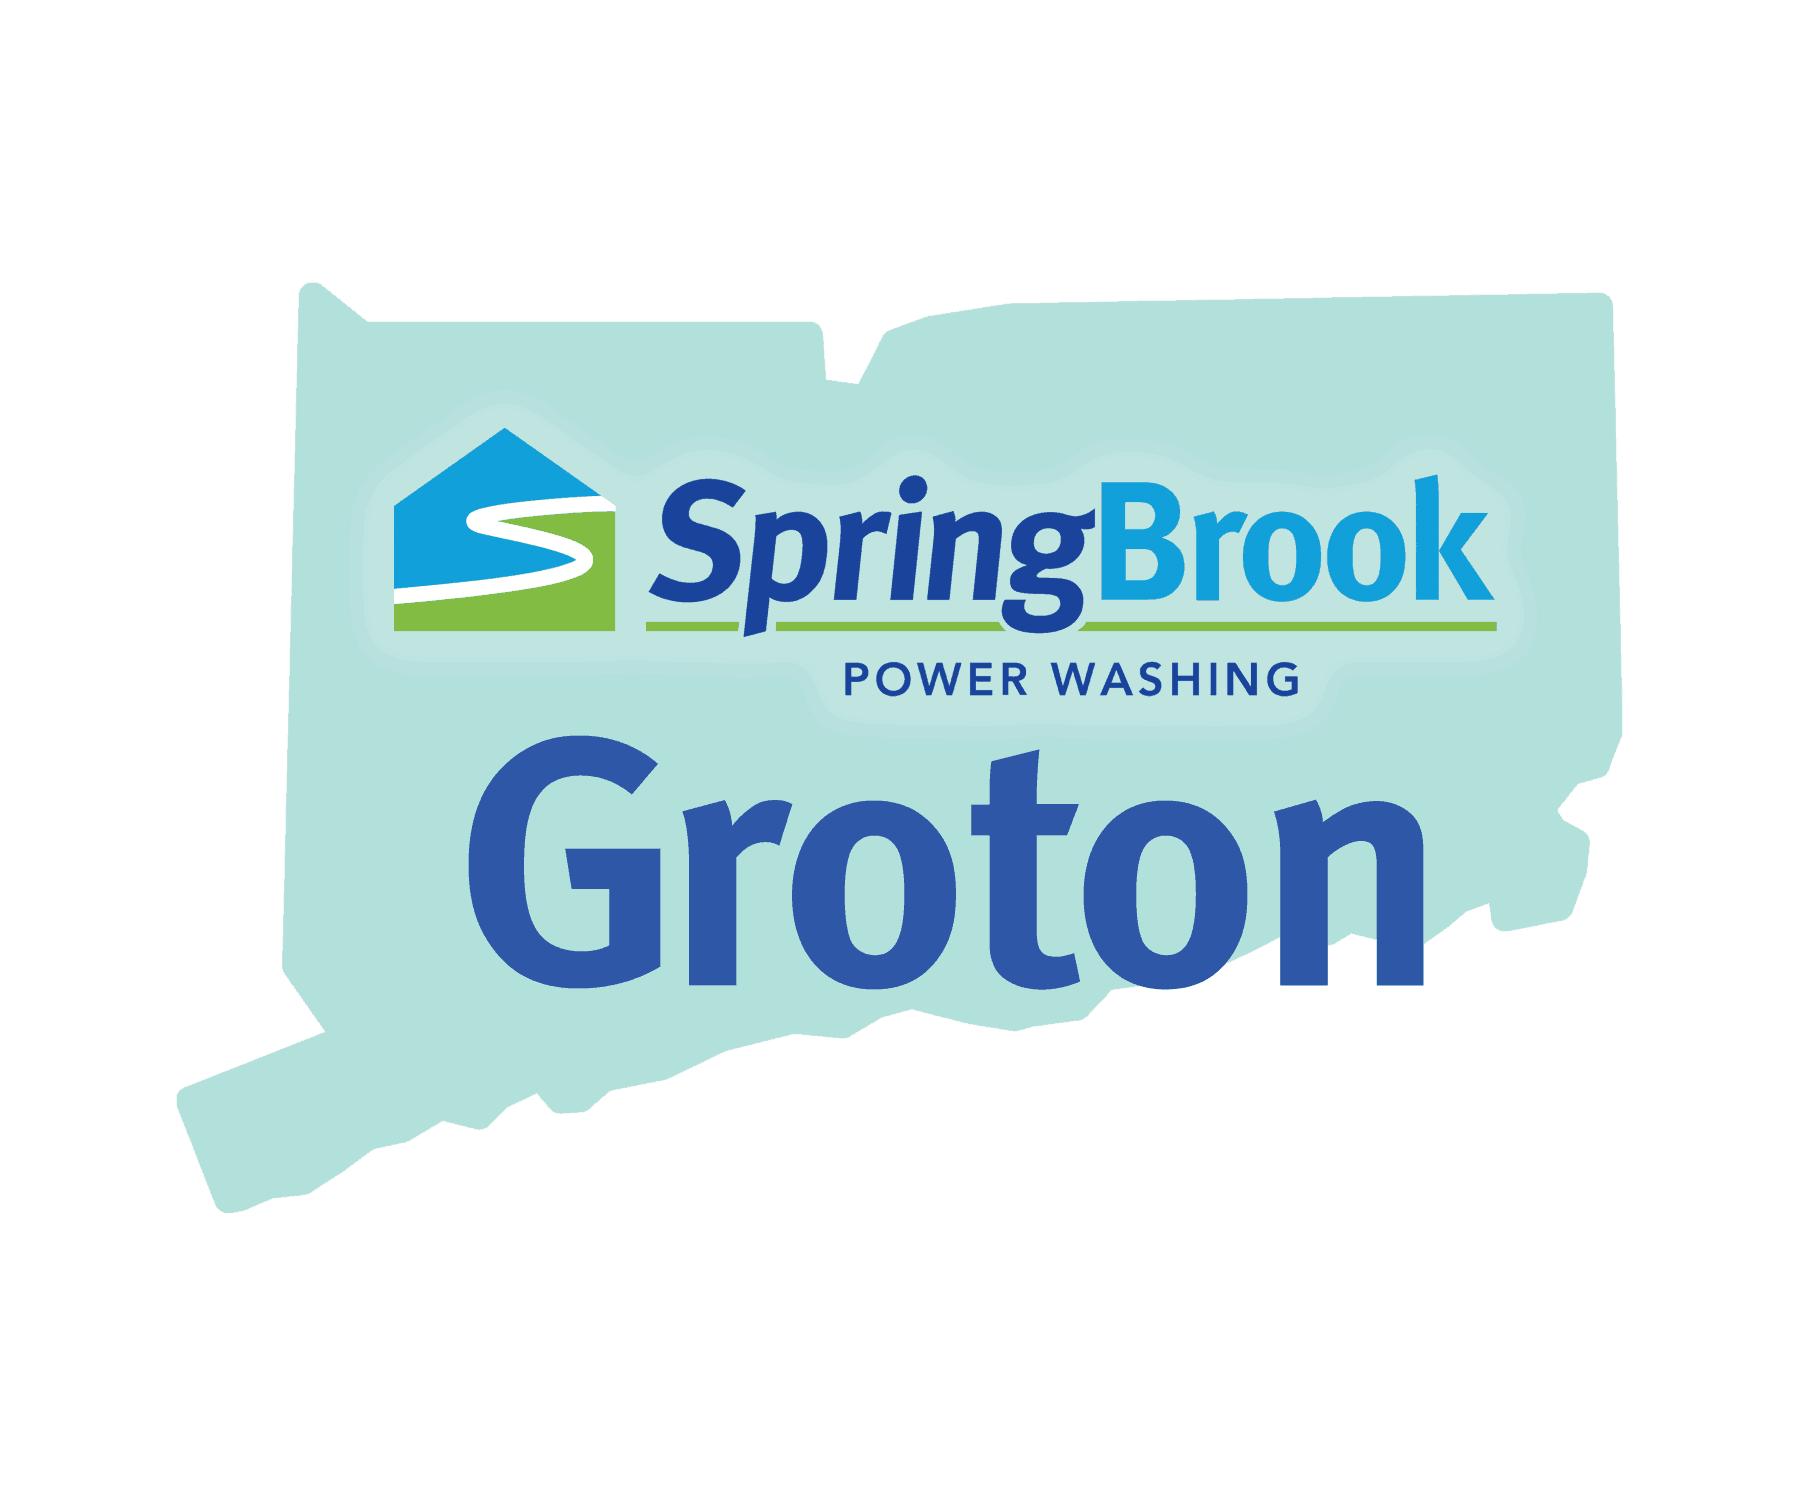 Springbrook Power Washing Groton Connecticut